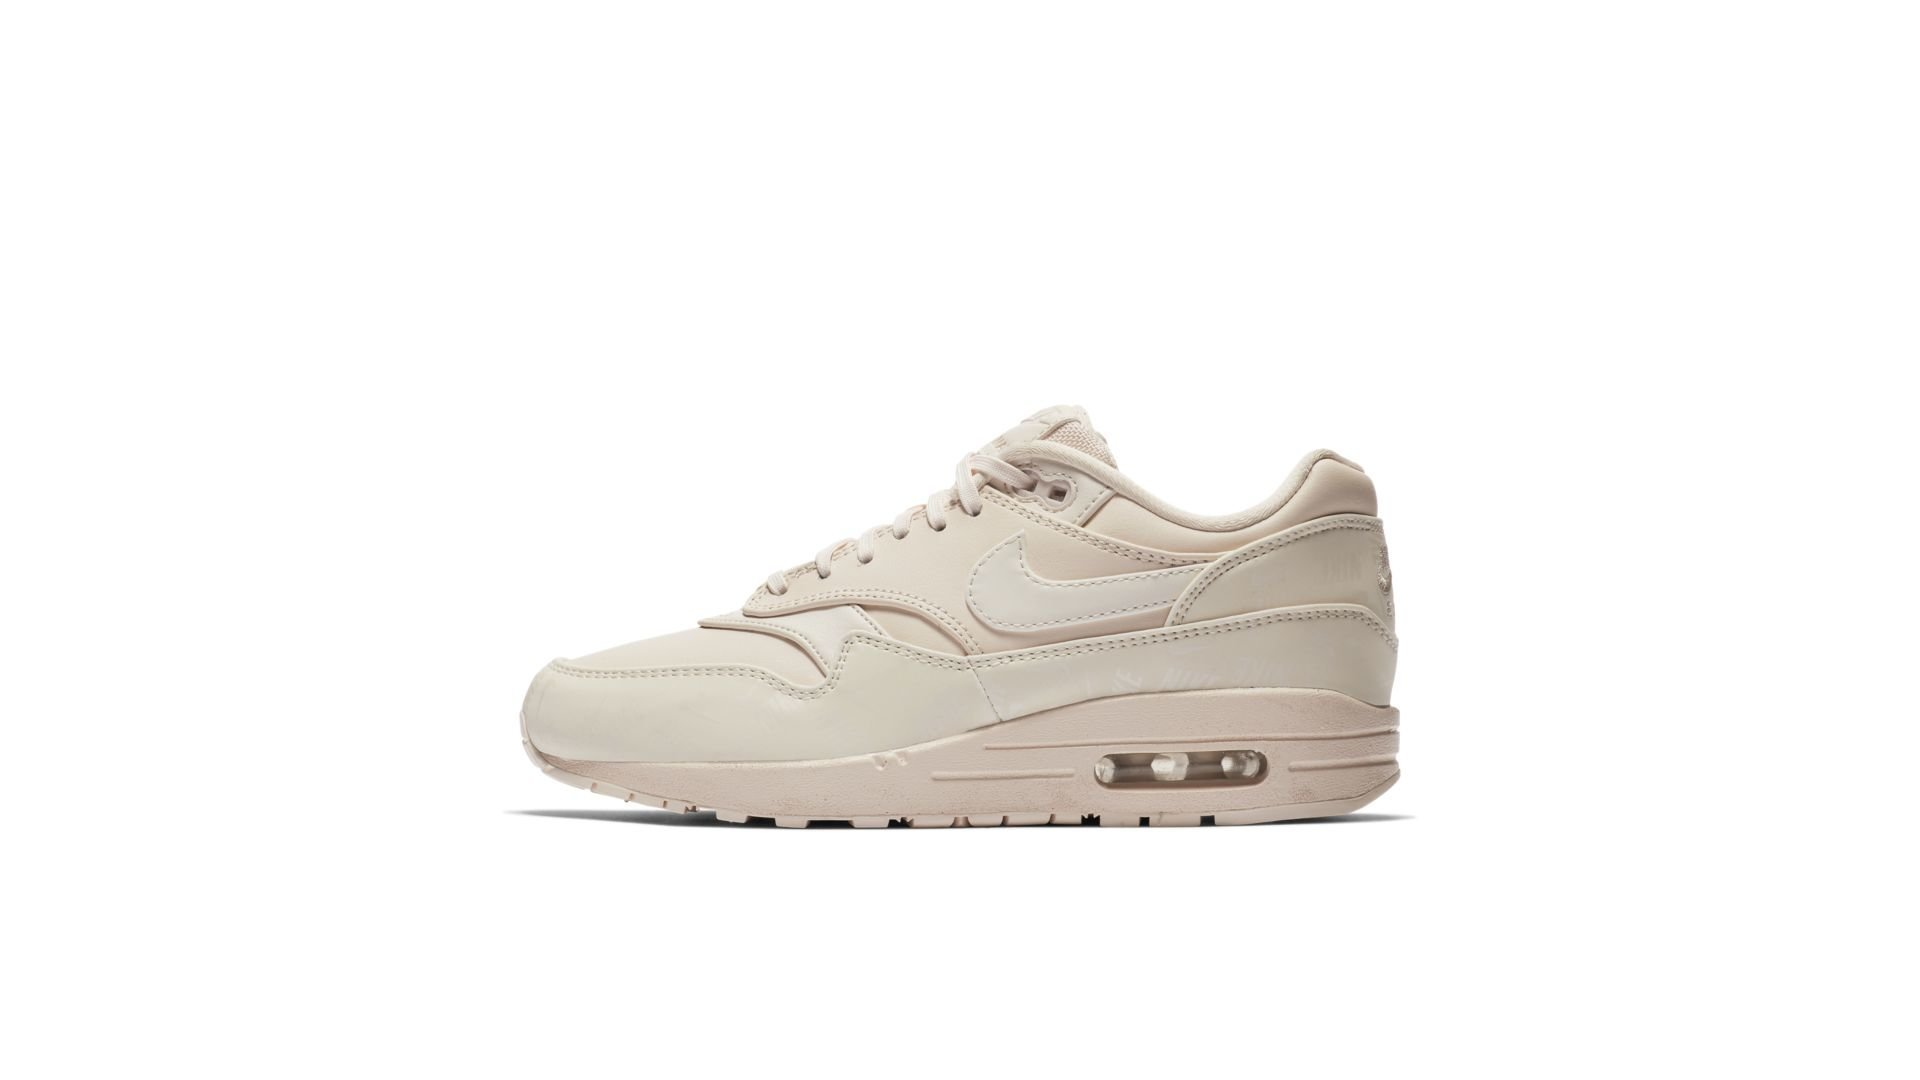 Nike WMNS Air Max 1 LX 'Guava Ice' (917691-801)